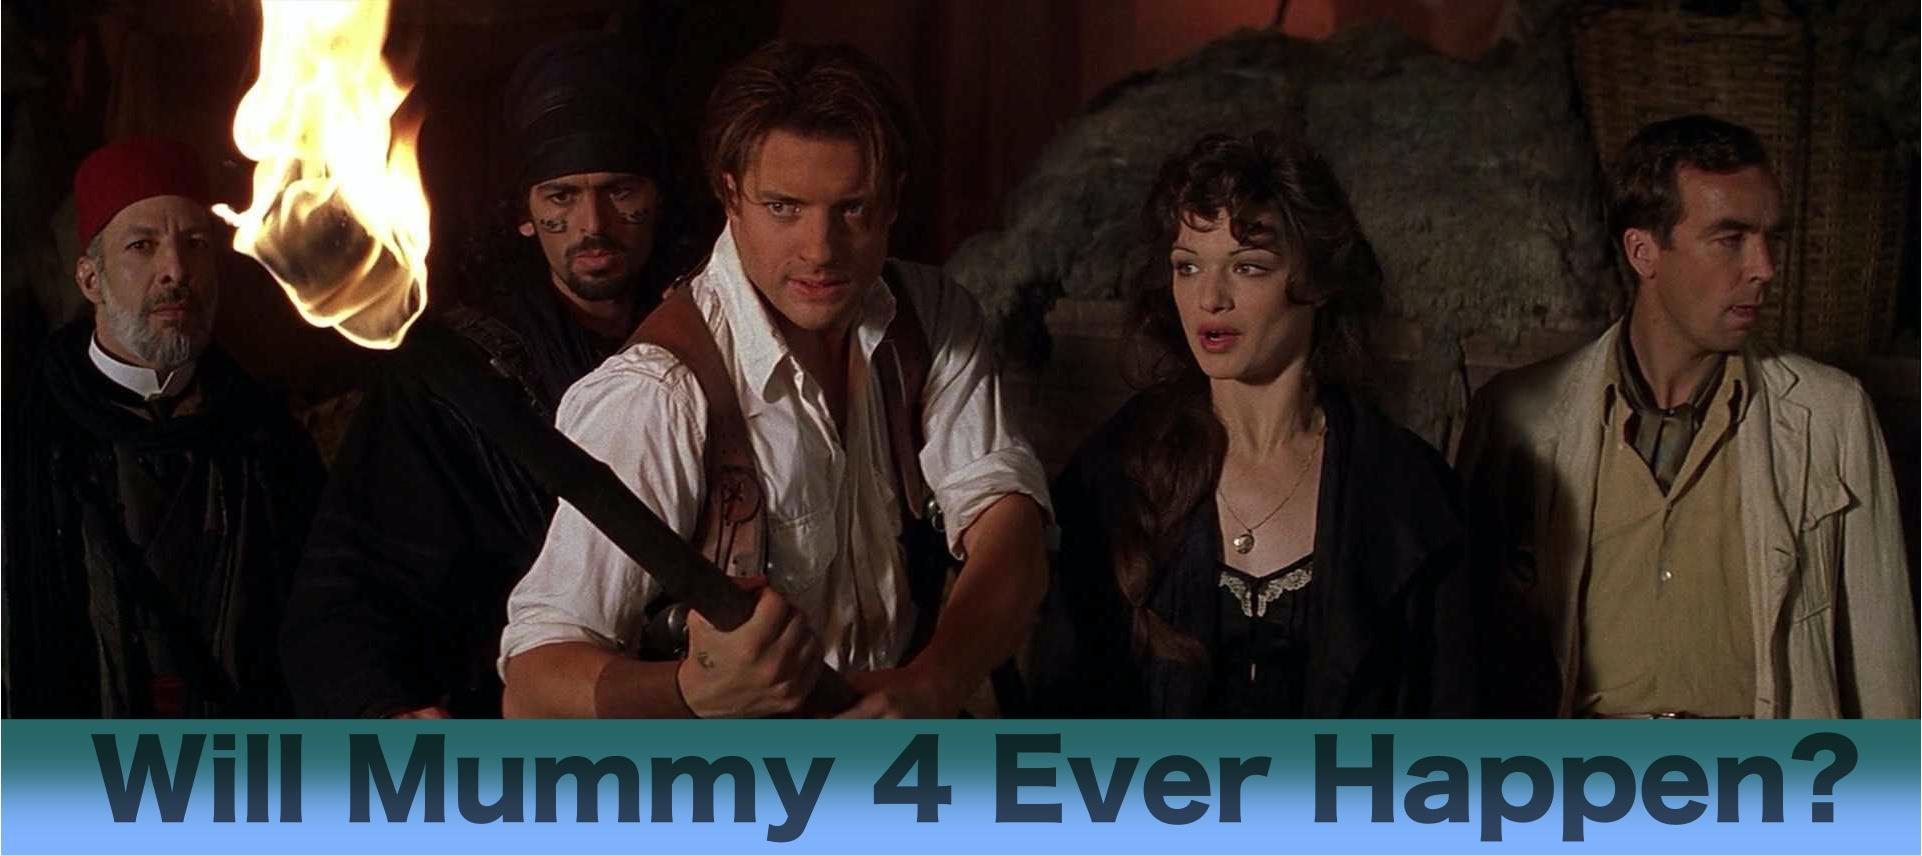 Will Mummy 4 Ever Happen? Rachel Weisz and Brendan Fraser Talks About the Franchise